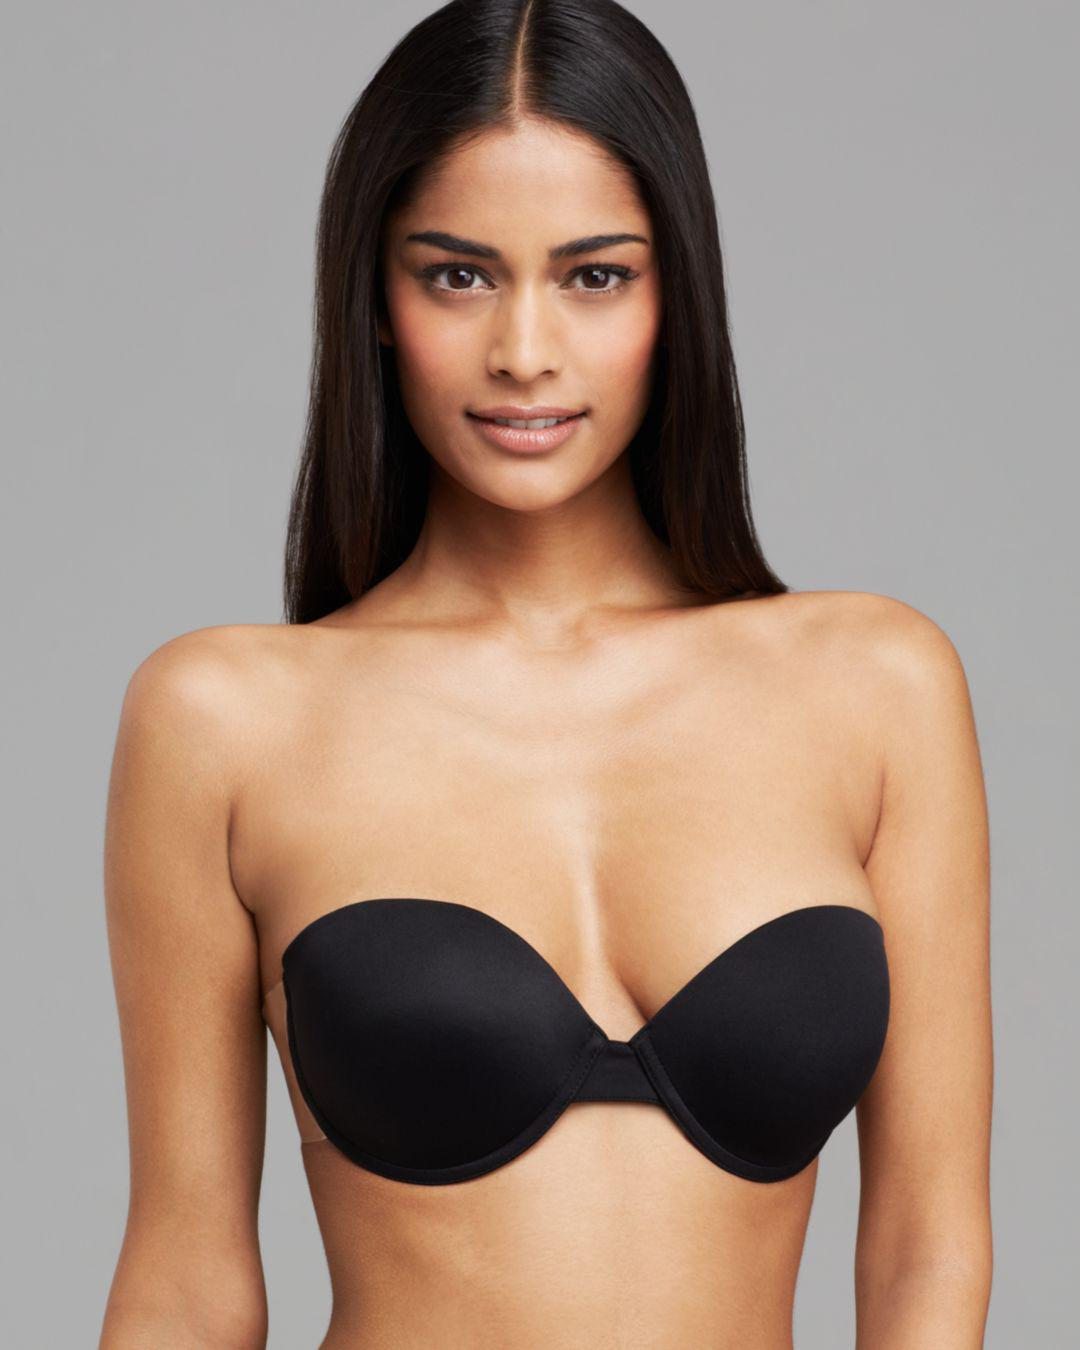 31c83f6ec Lyst - Fashion Forms Go Bre Ultimate Boost Self-Adhesive Bra in Black